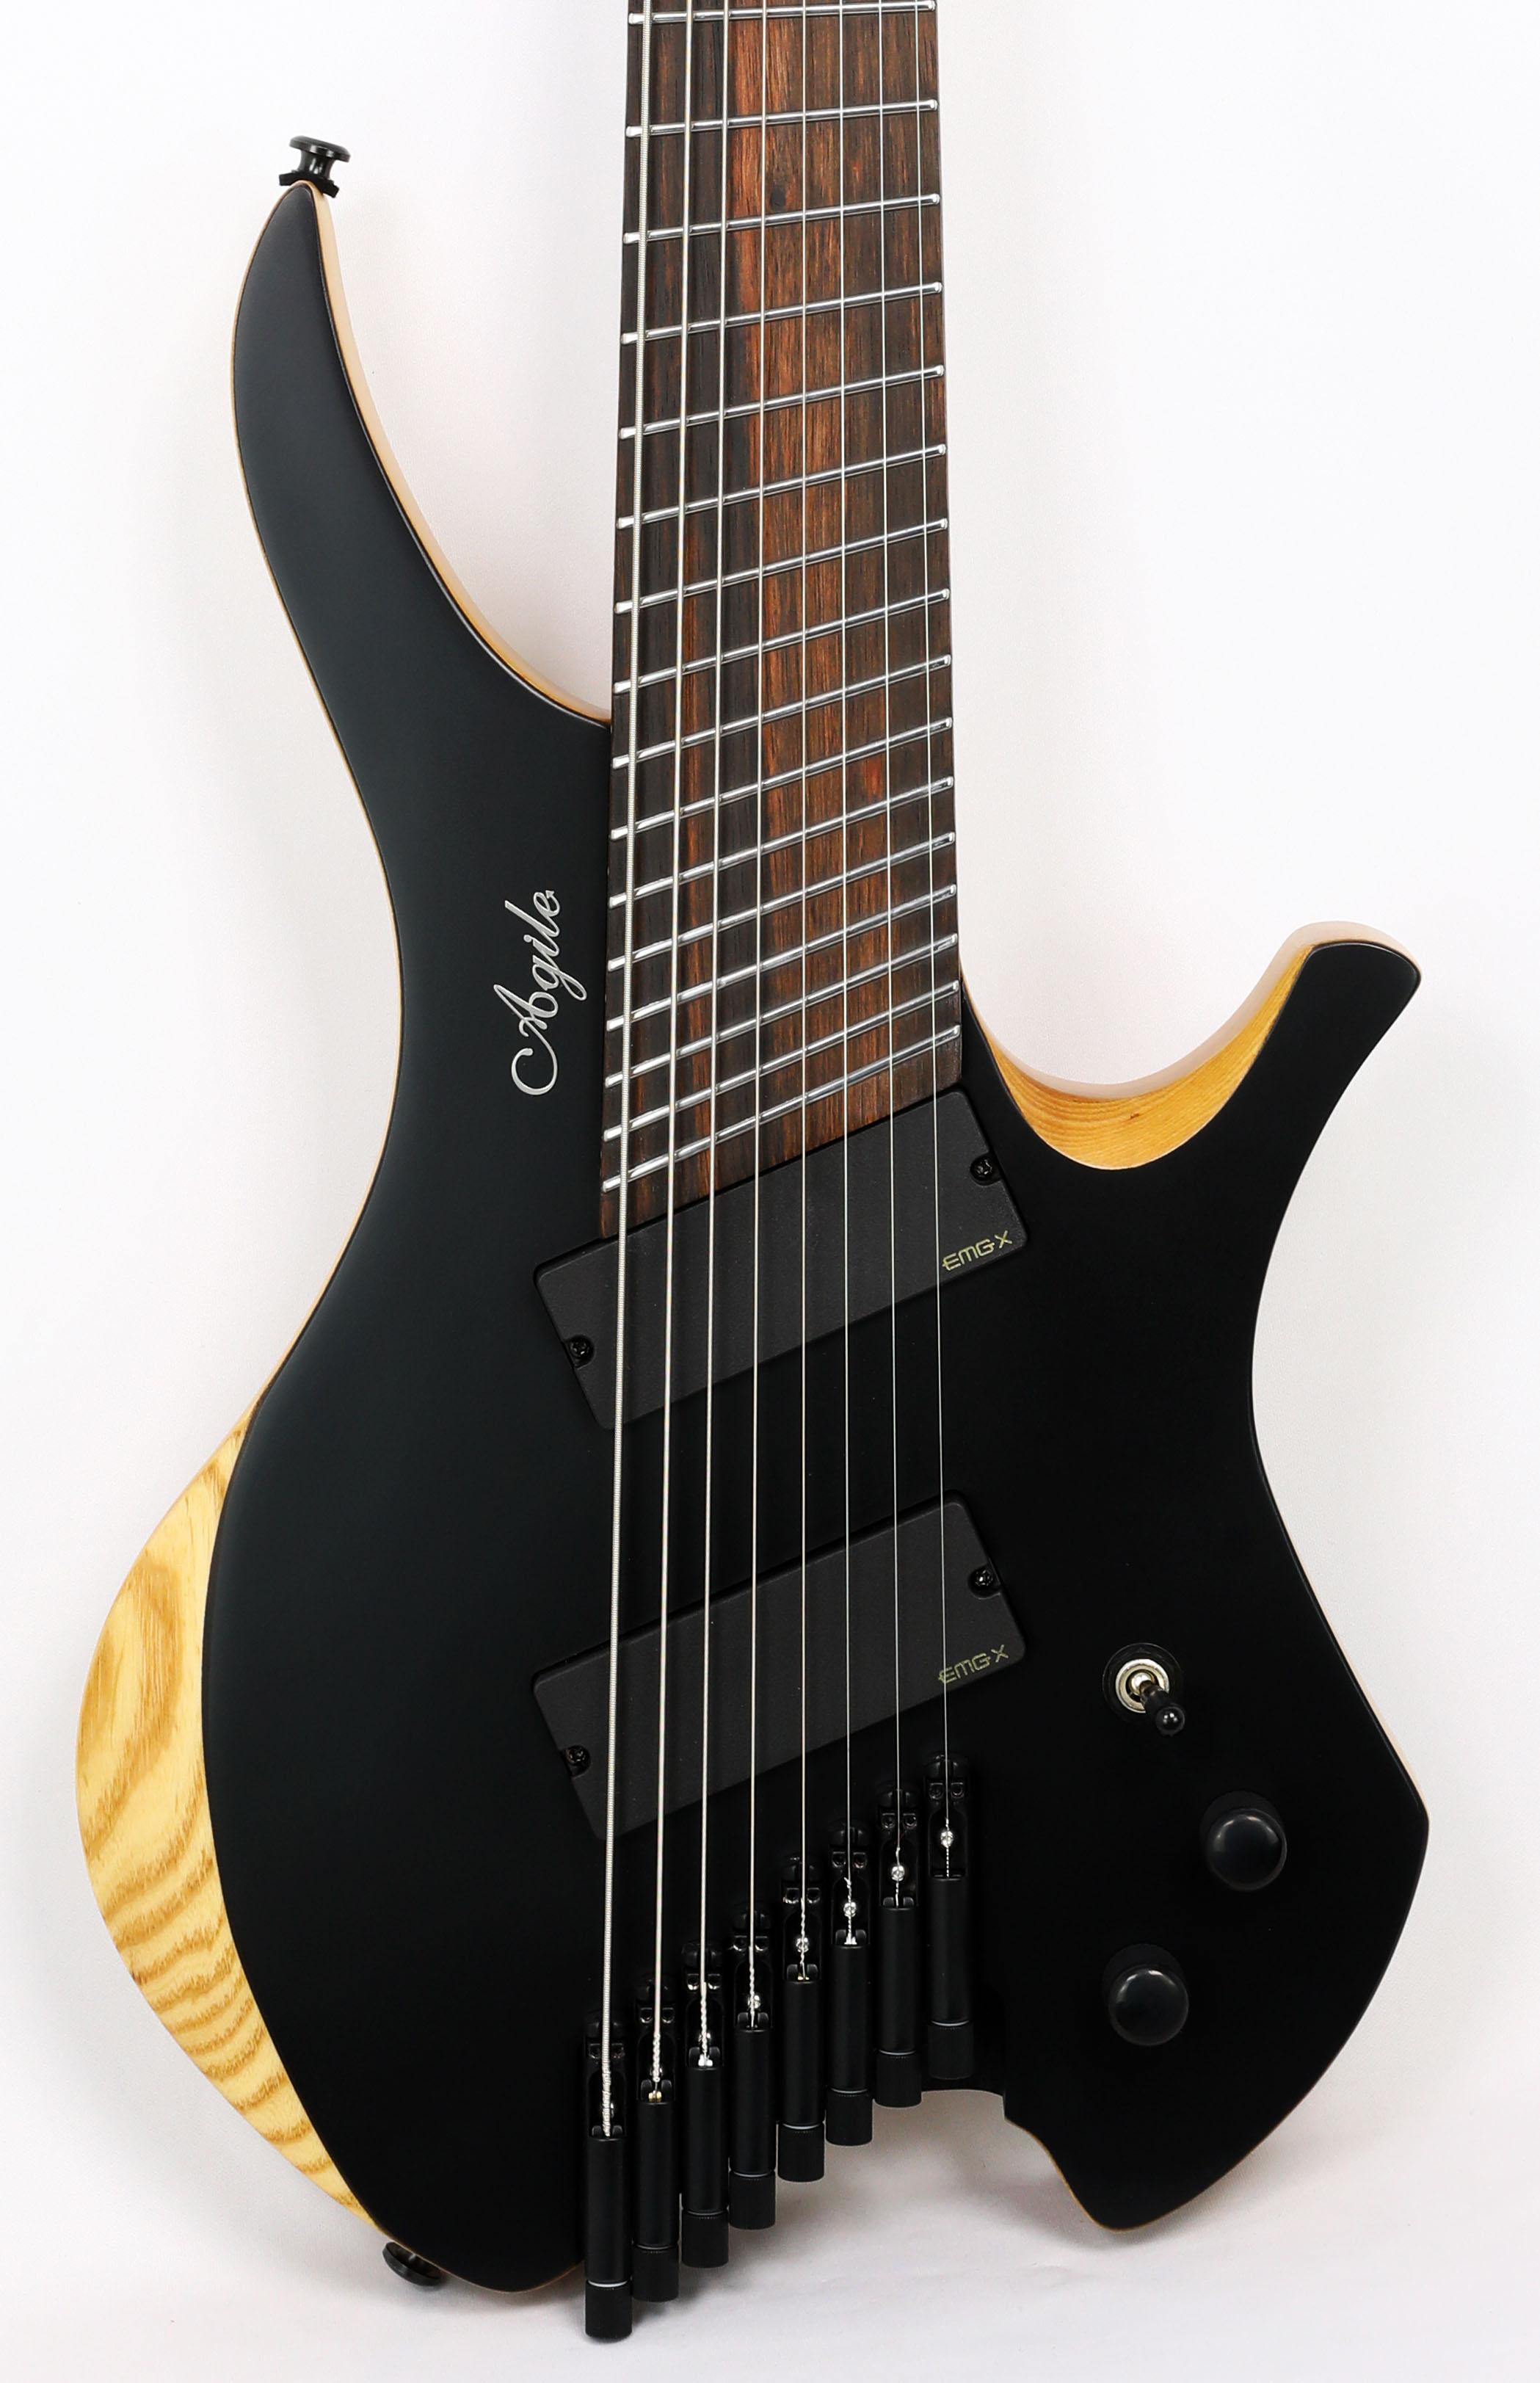 Agile Chiral Nirvana 82528 EB MOD SS Flat Black Headless Guitar